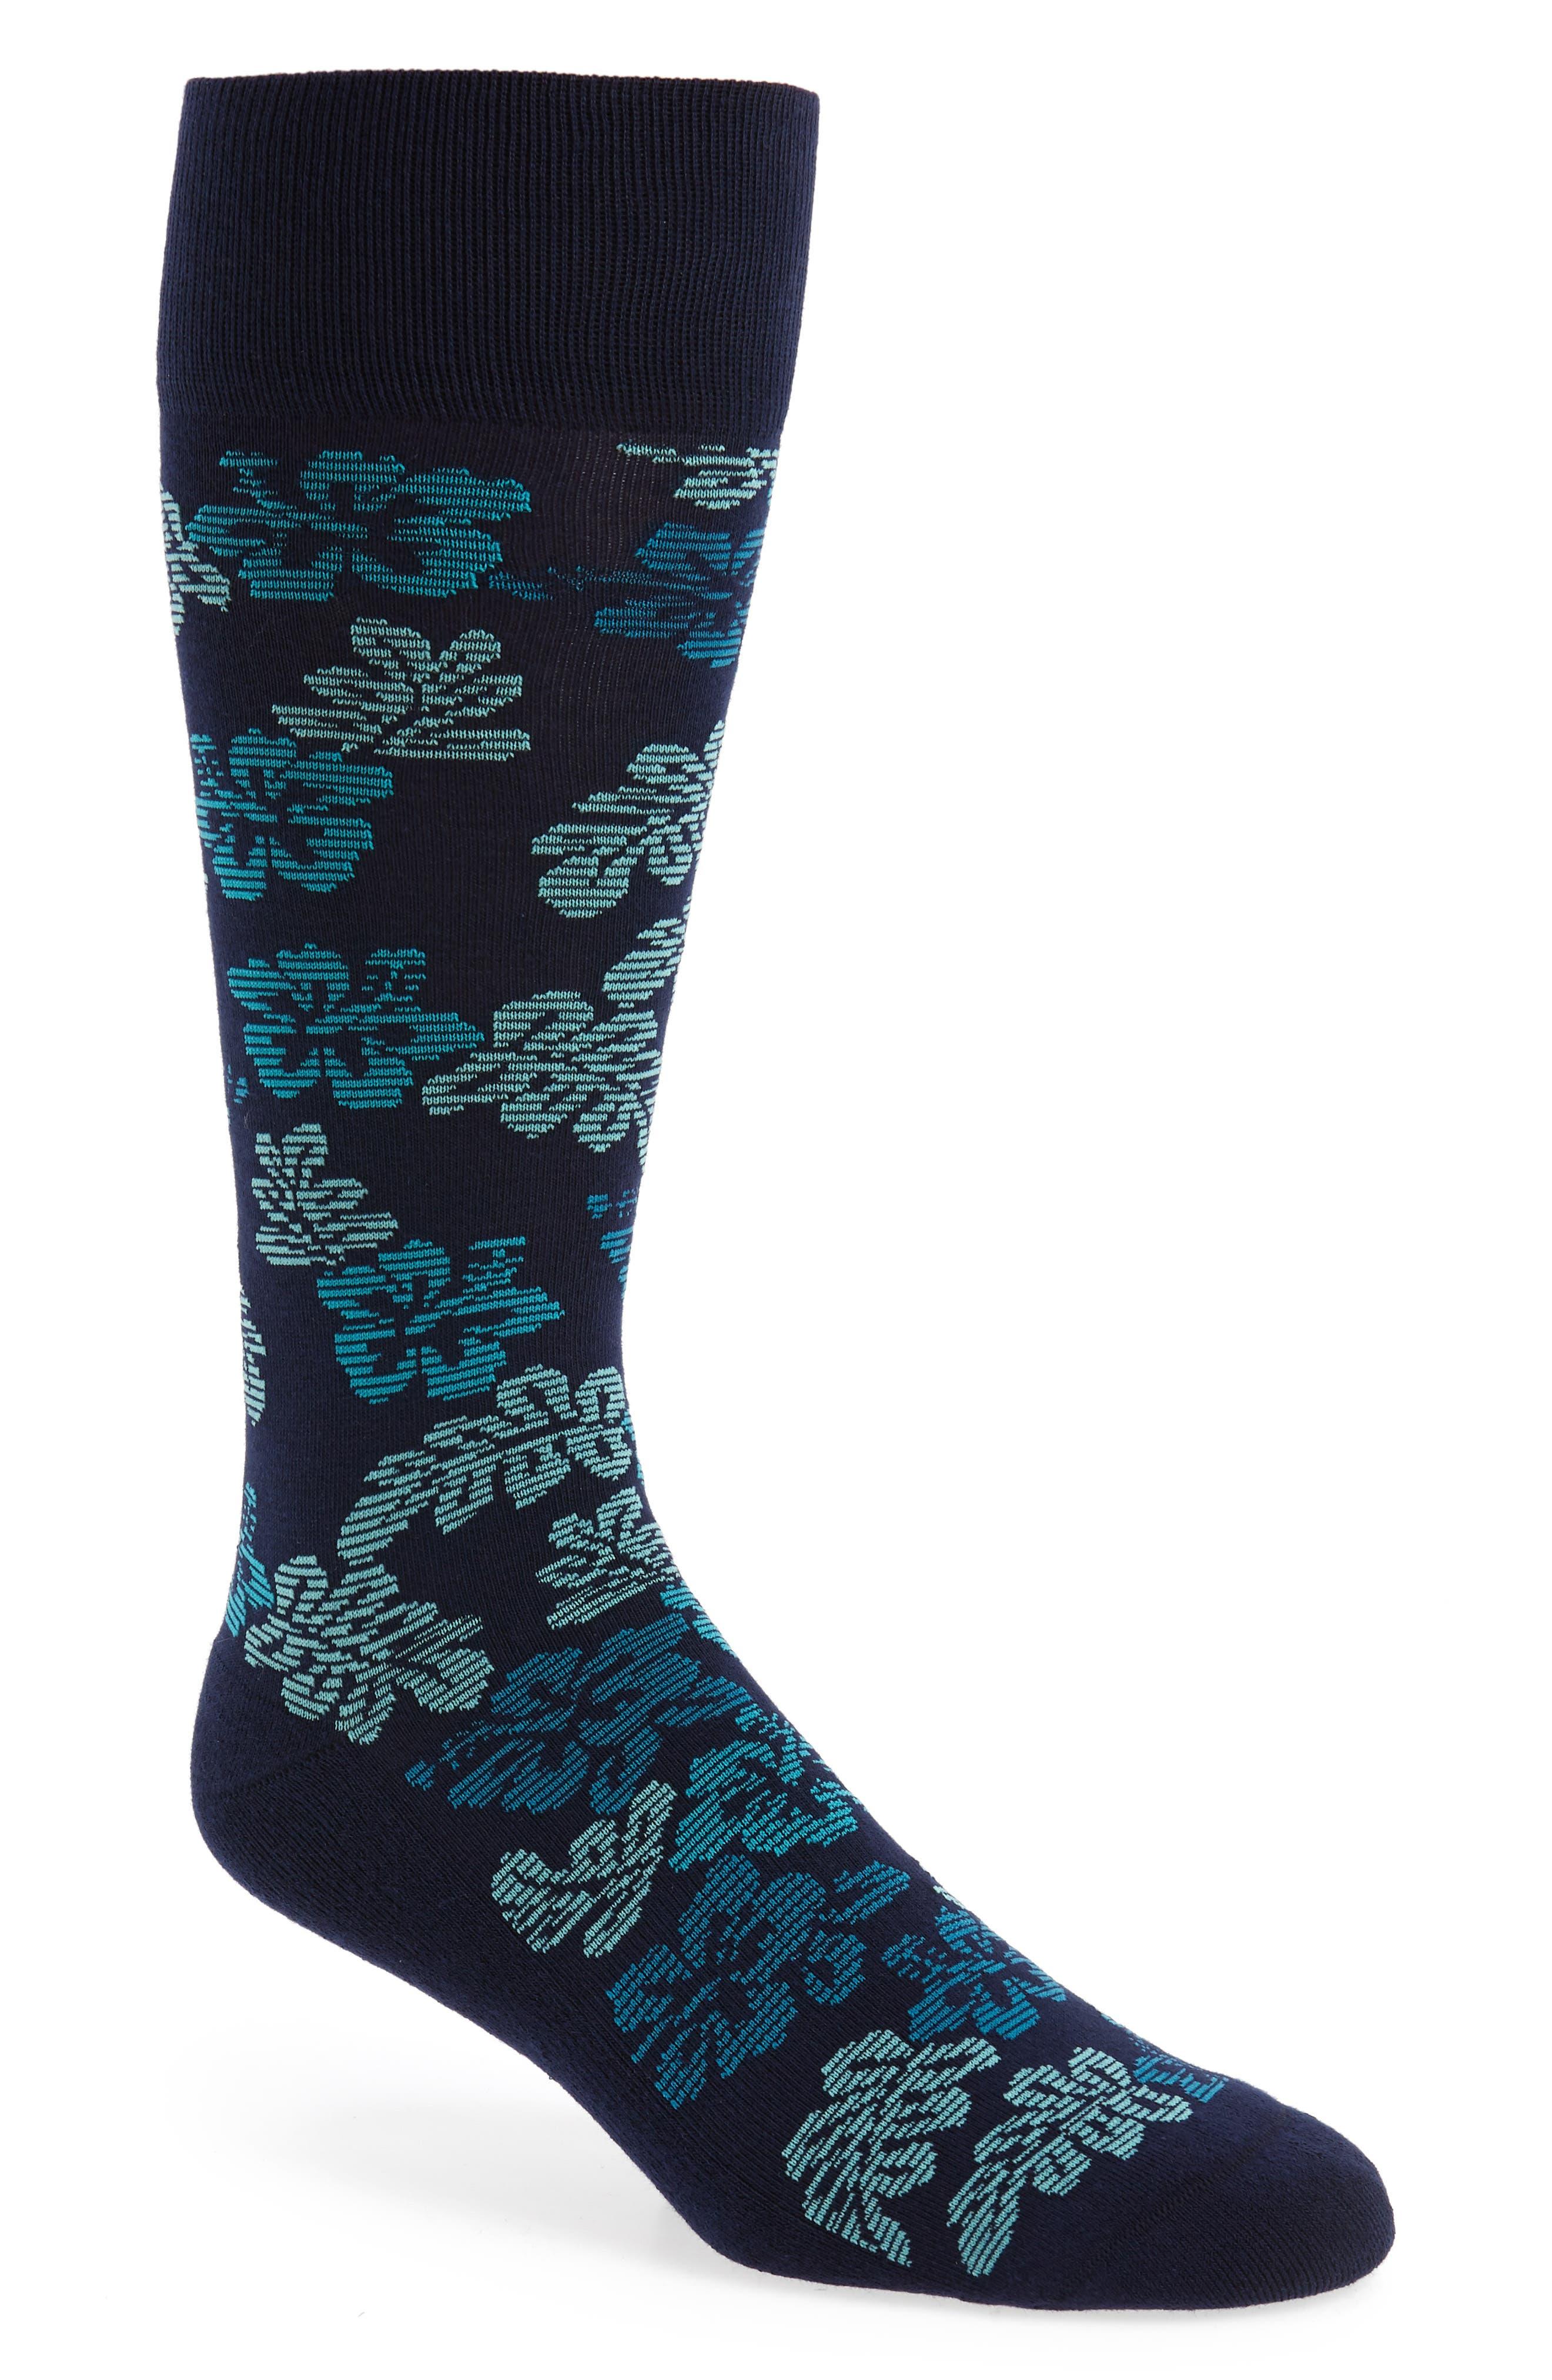 Hibiscus Vibe Socks,                             Main thumbnail 1, color,                             Navy/ Teal